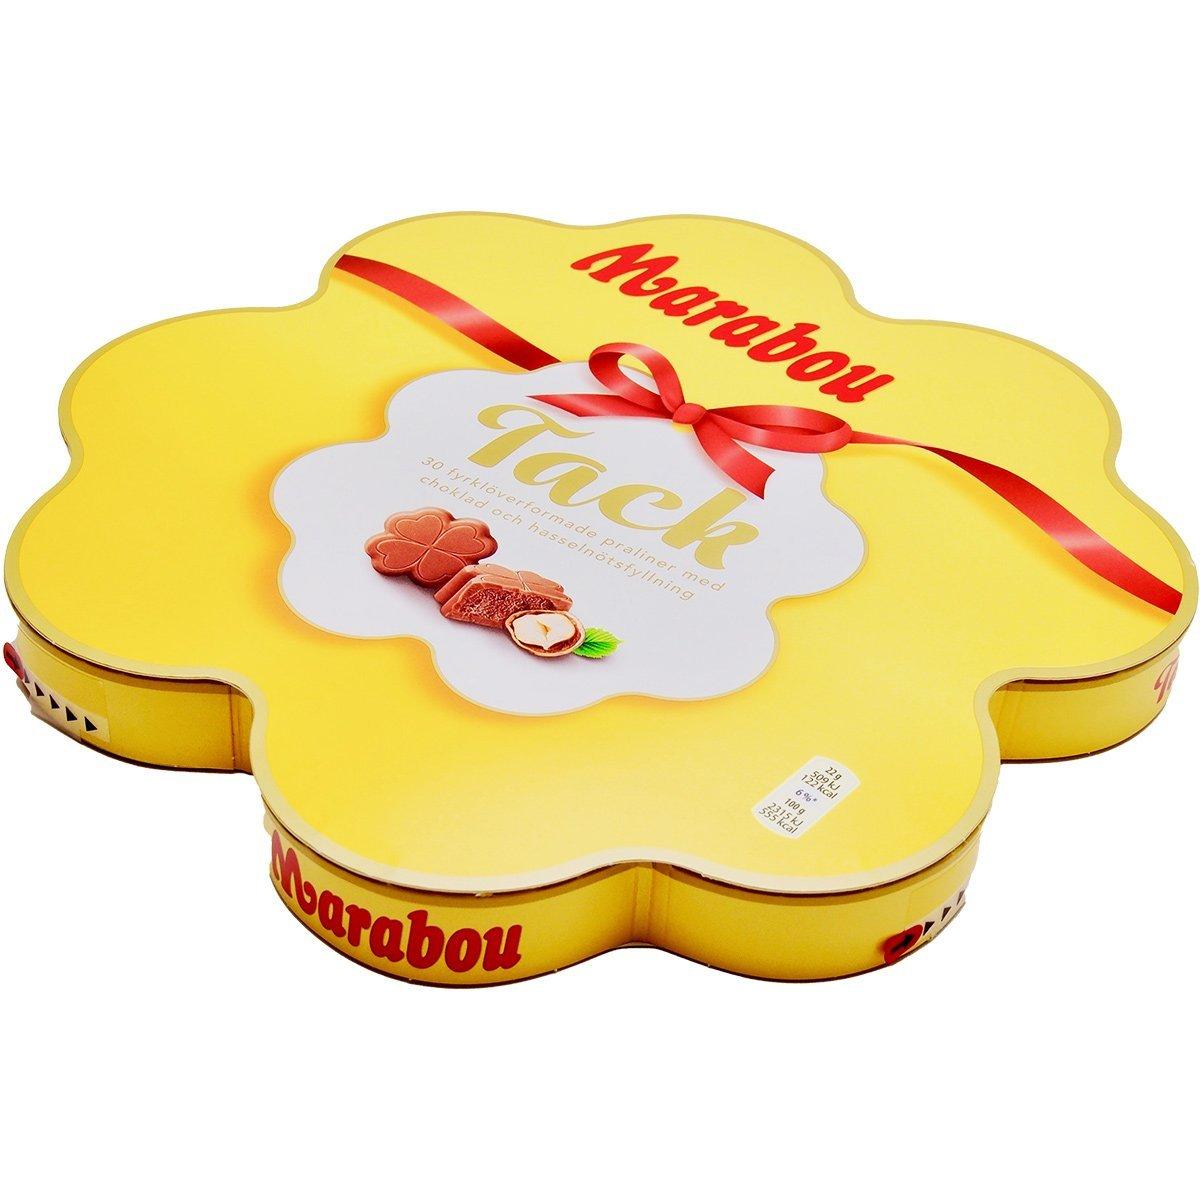 Marabou Tack (Danke) Pralinen (165g) 1